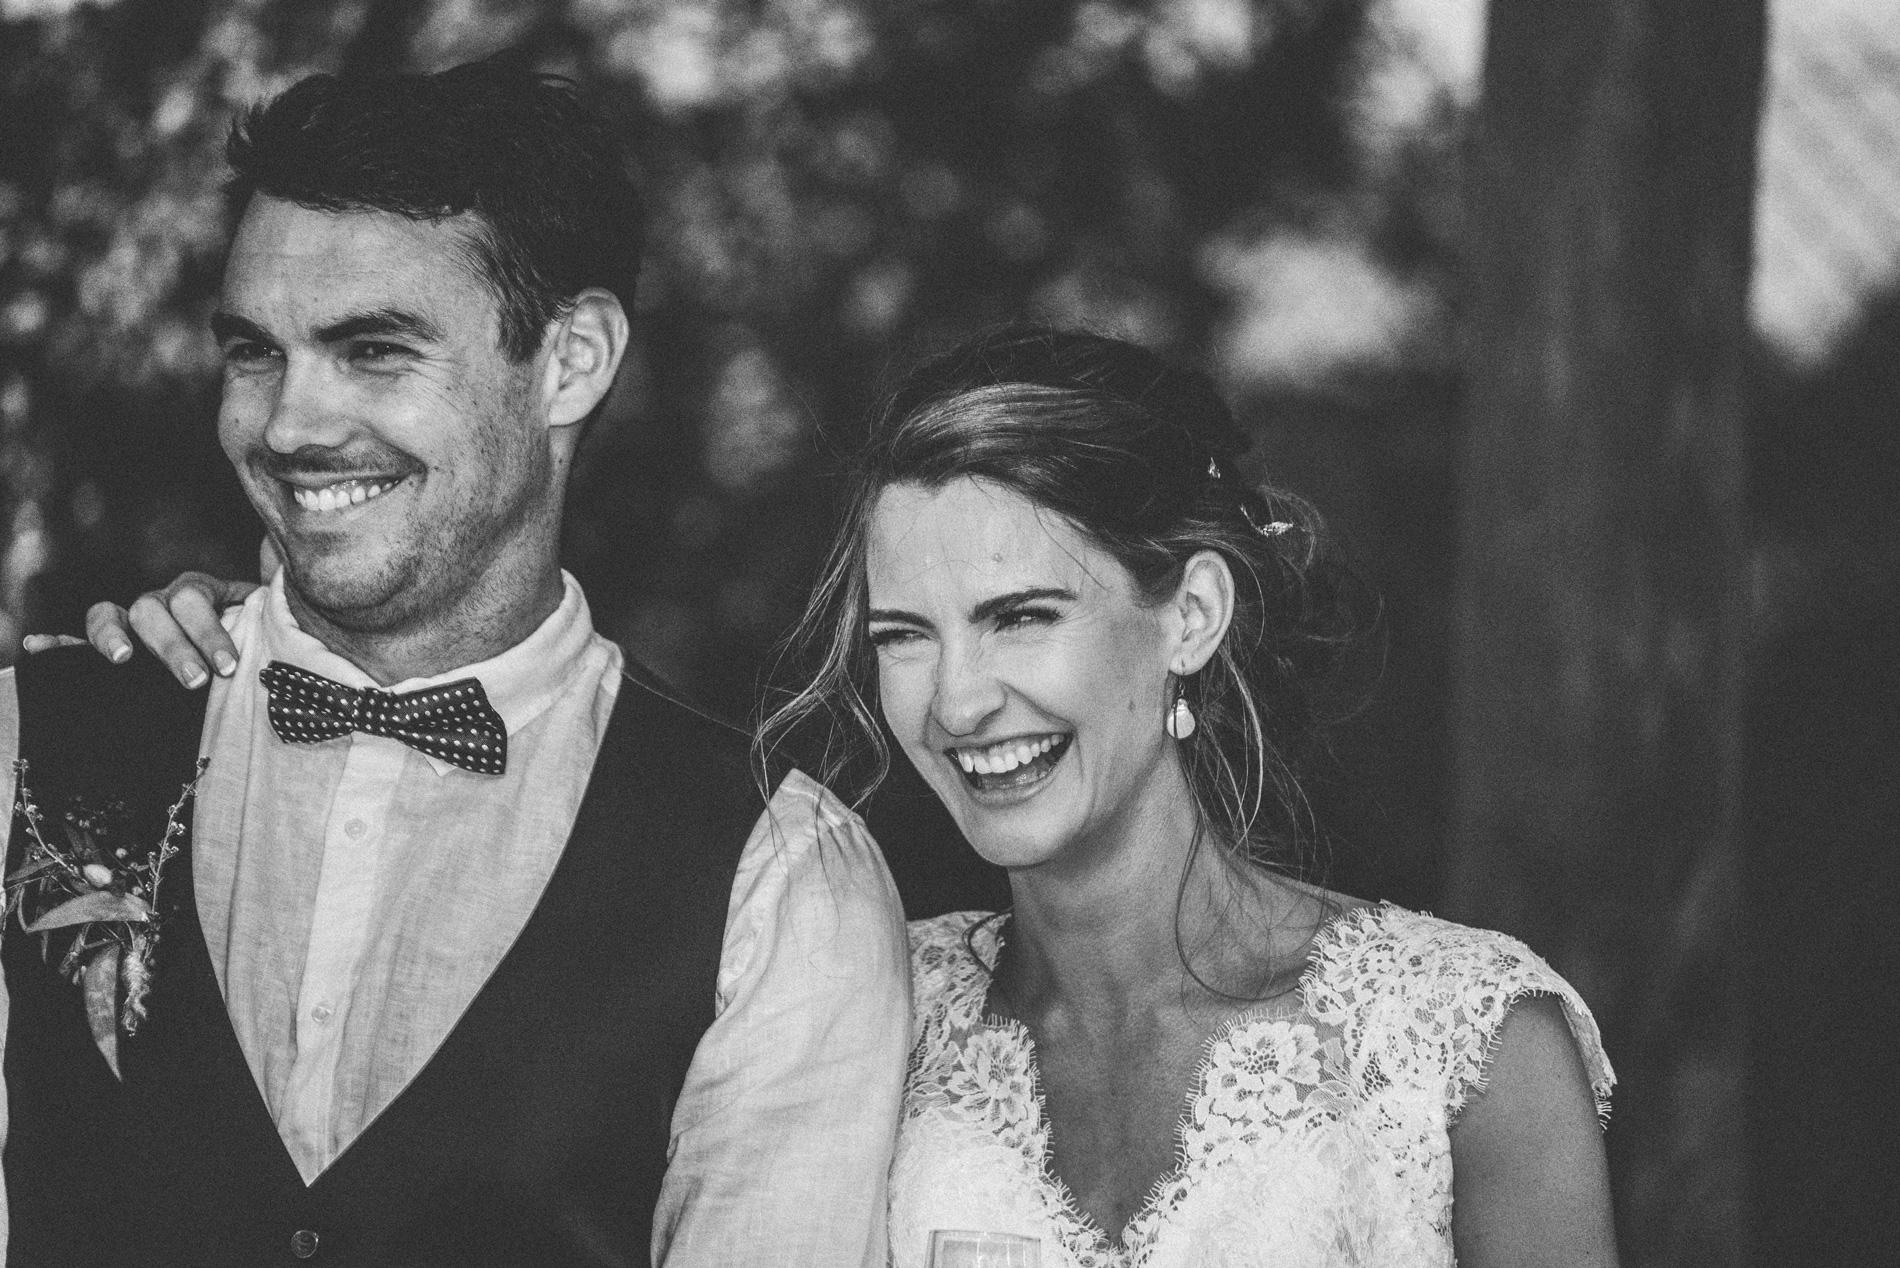 seattle-wedding-photographer-kyle-larson381